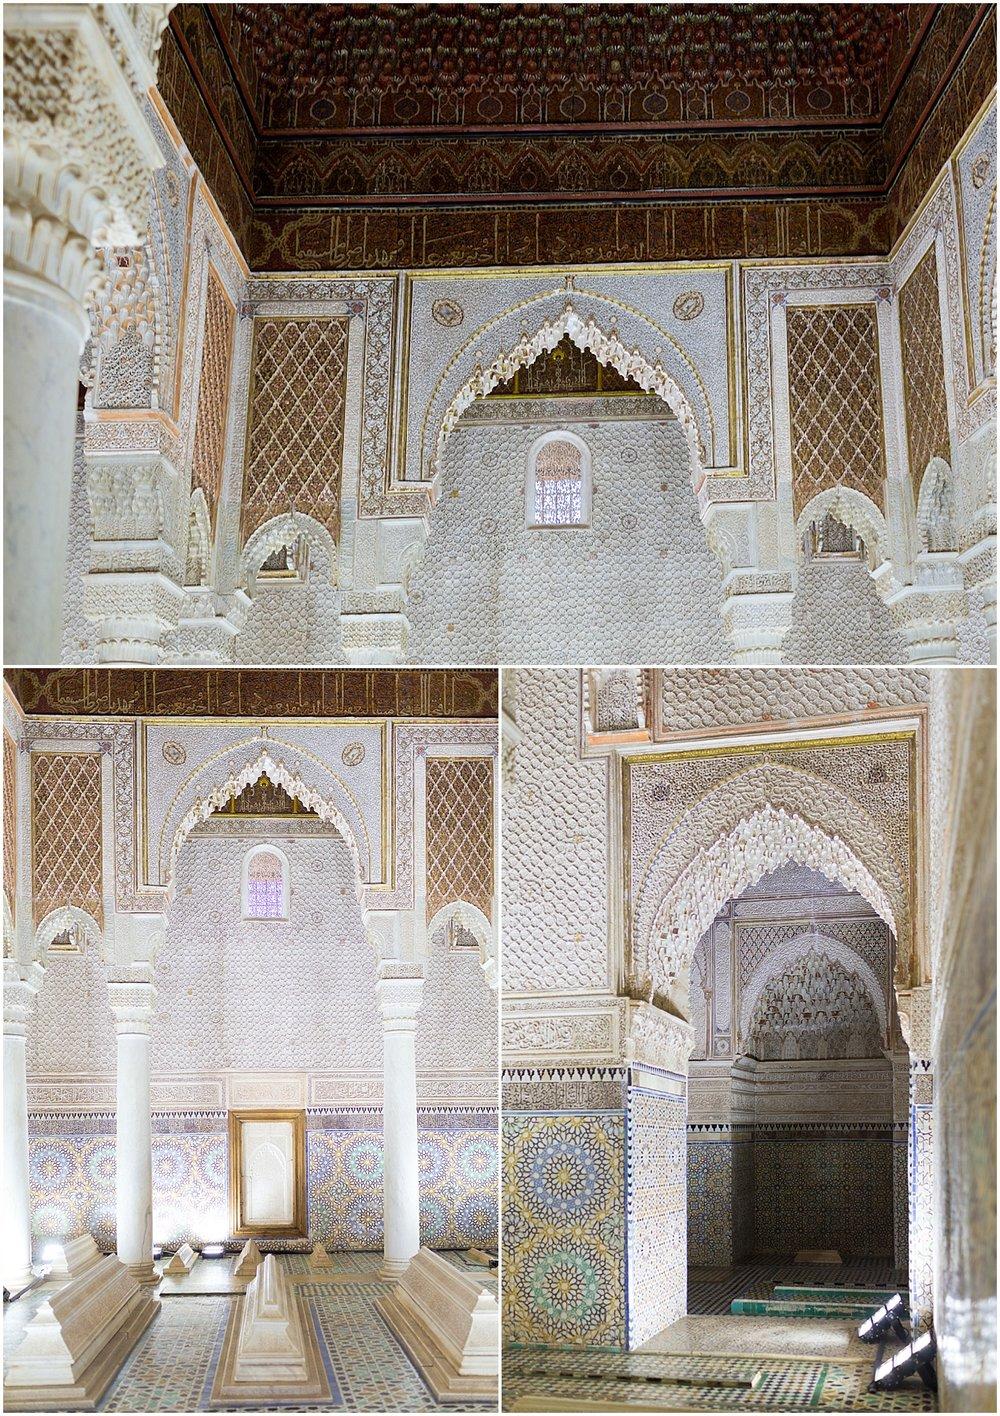 Saadian tombs in Marrakech - Morocco travel blog